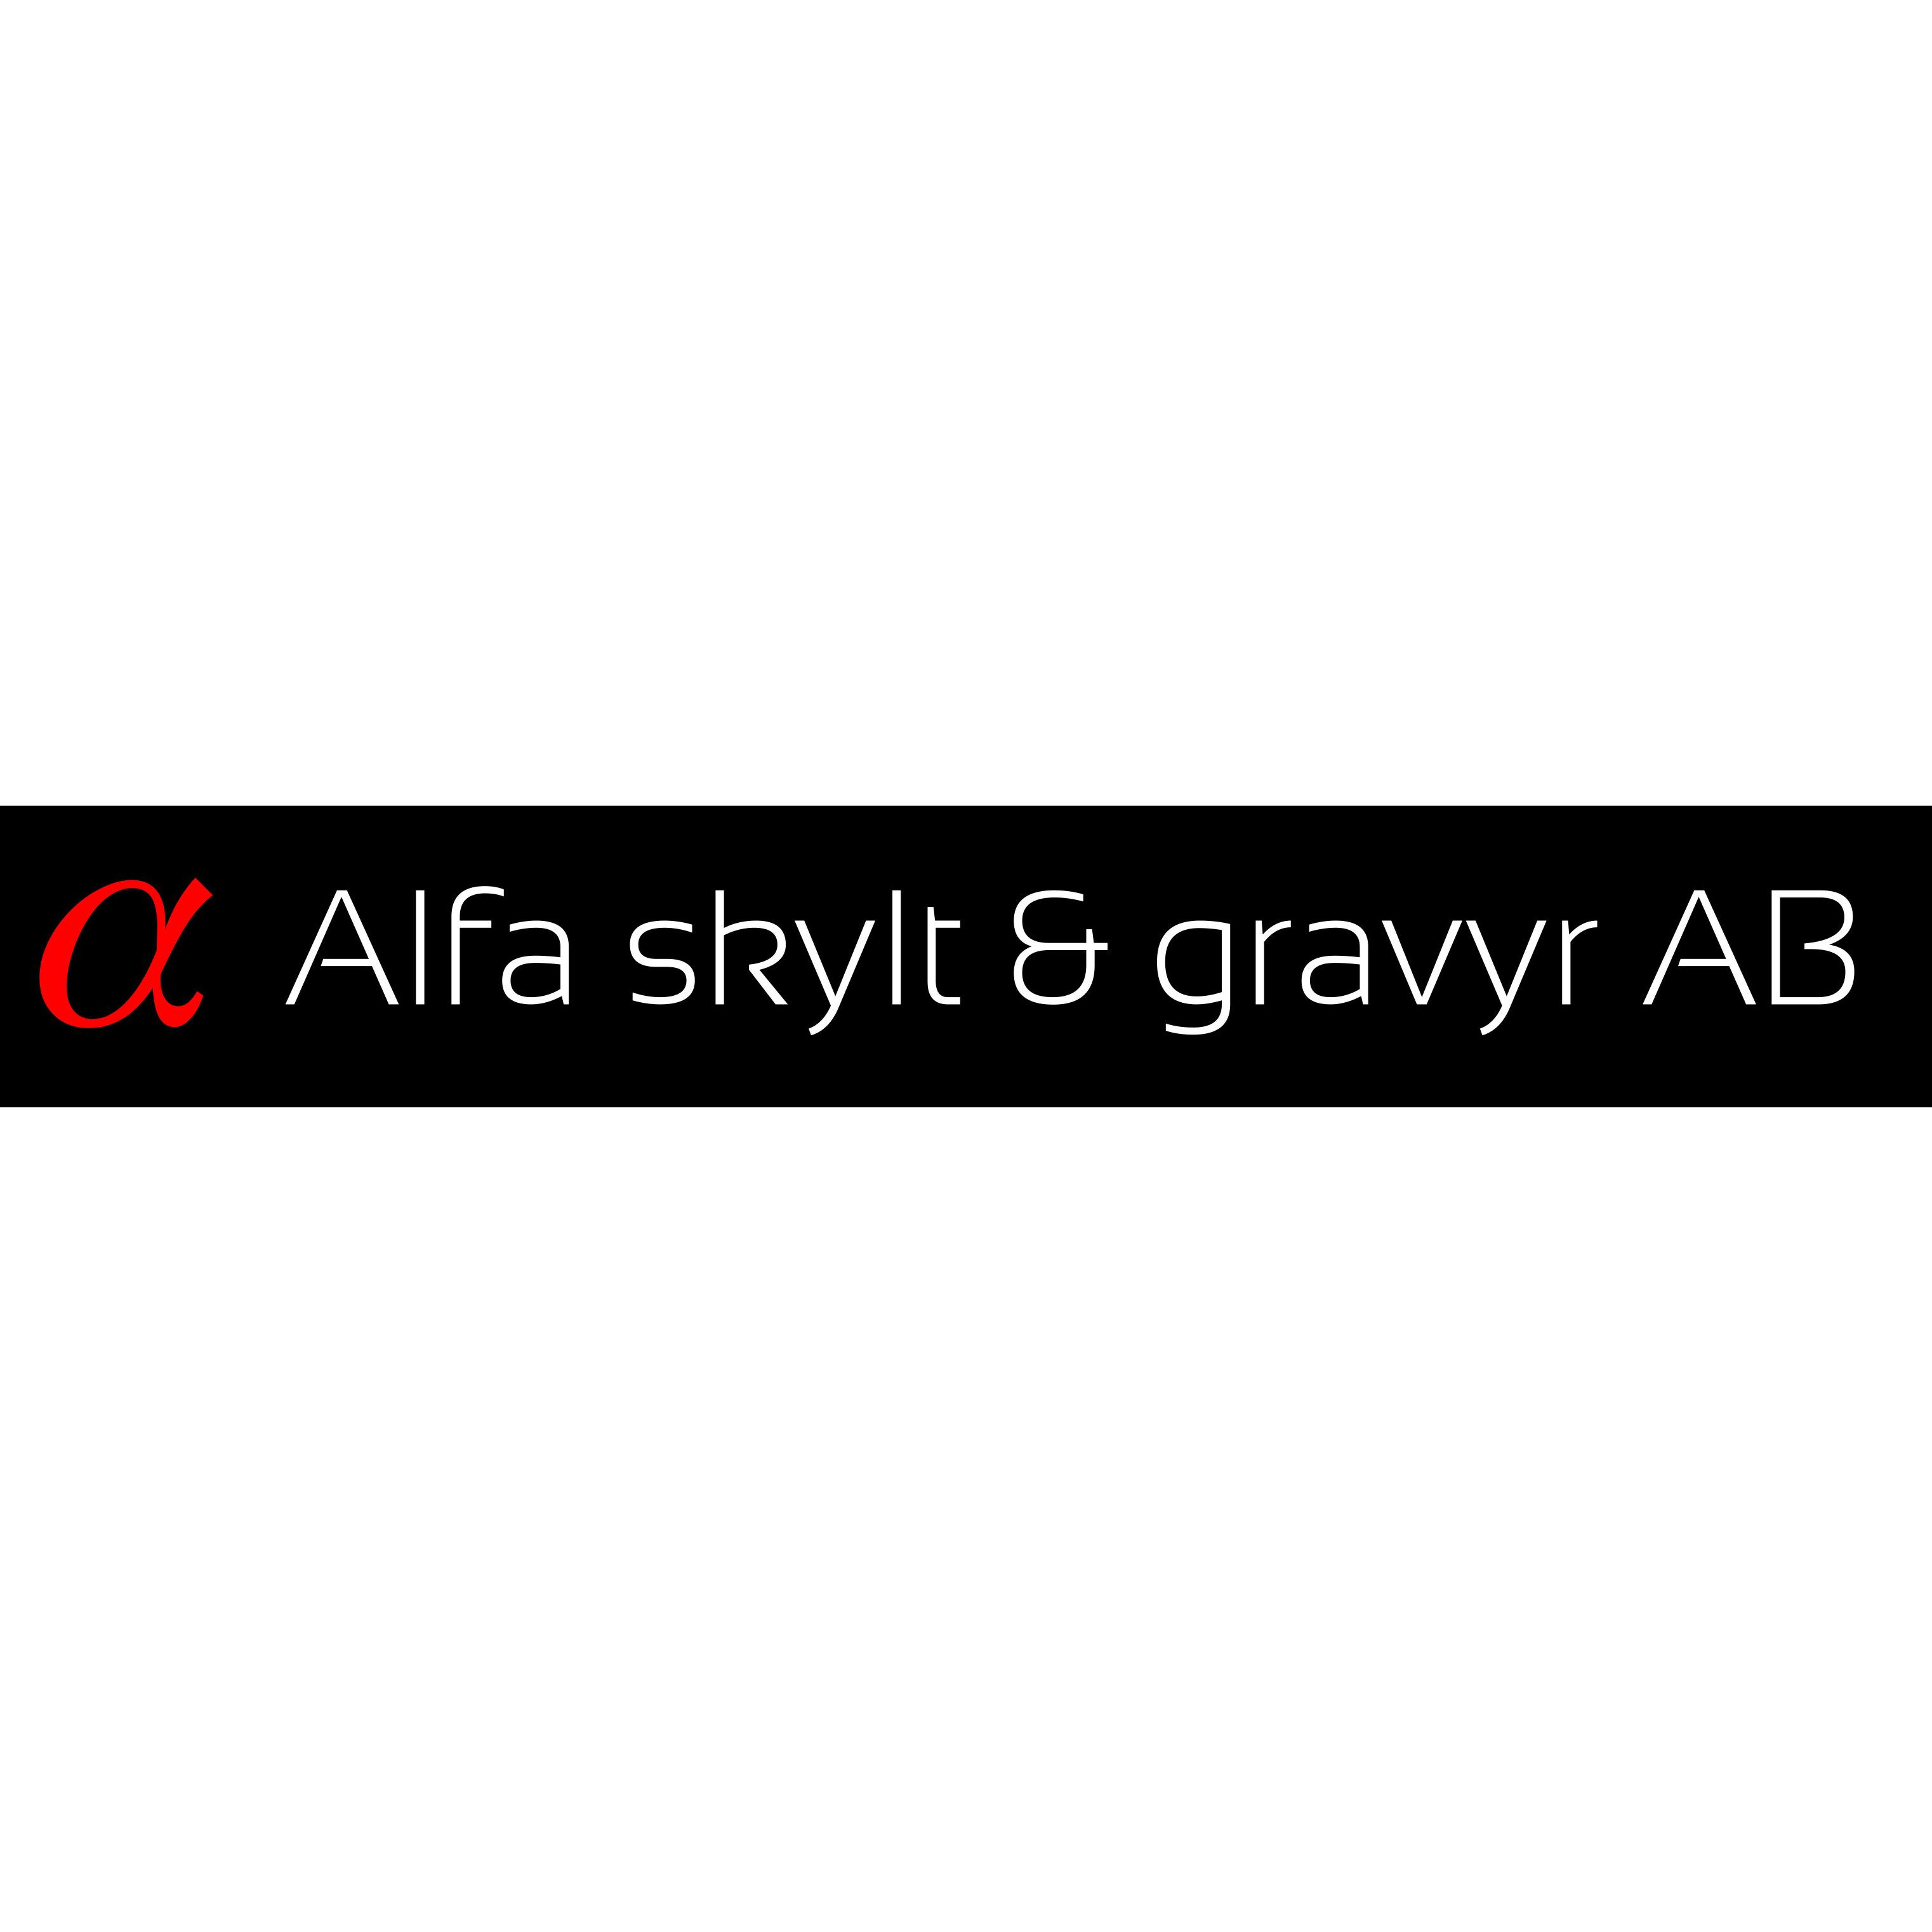 Alfa Skylt & Gravyr AB